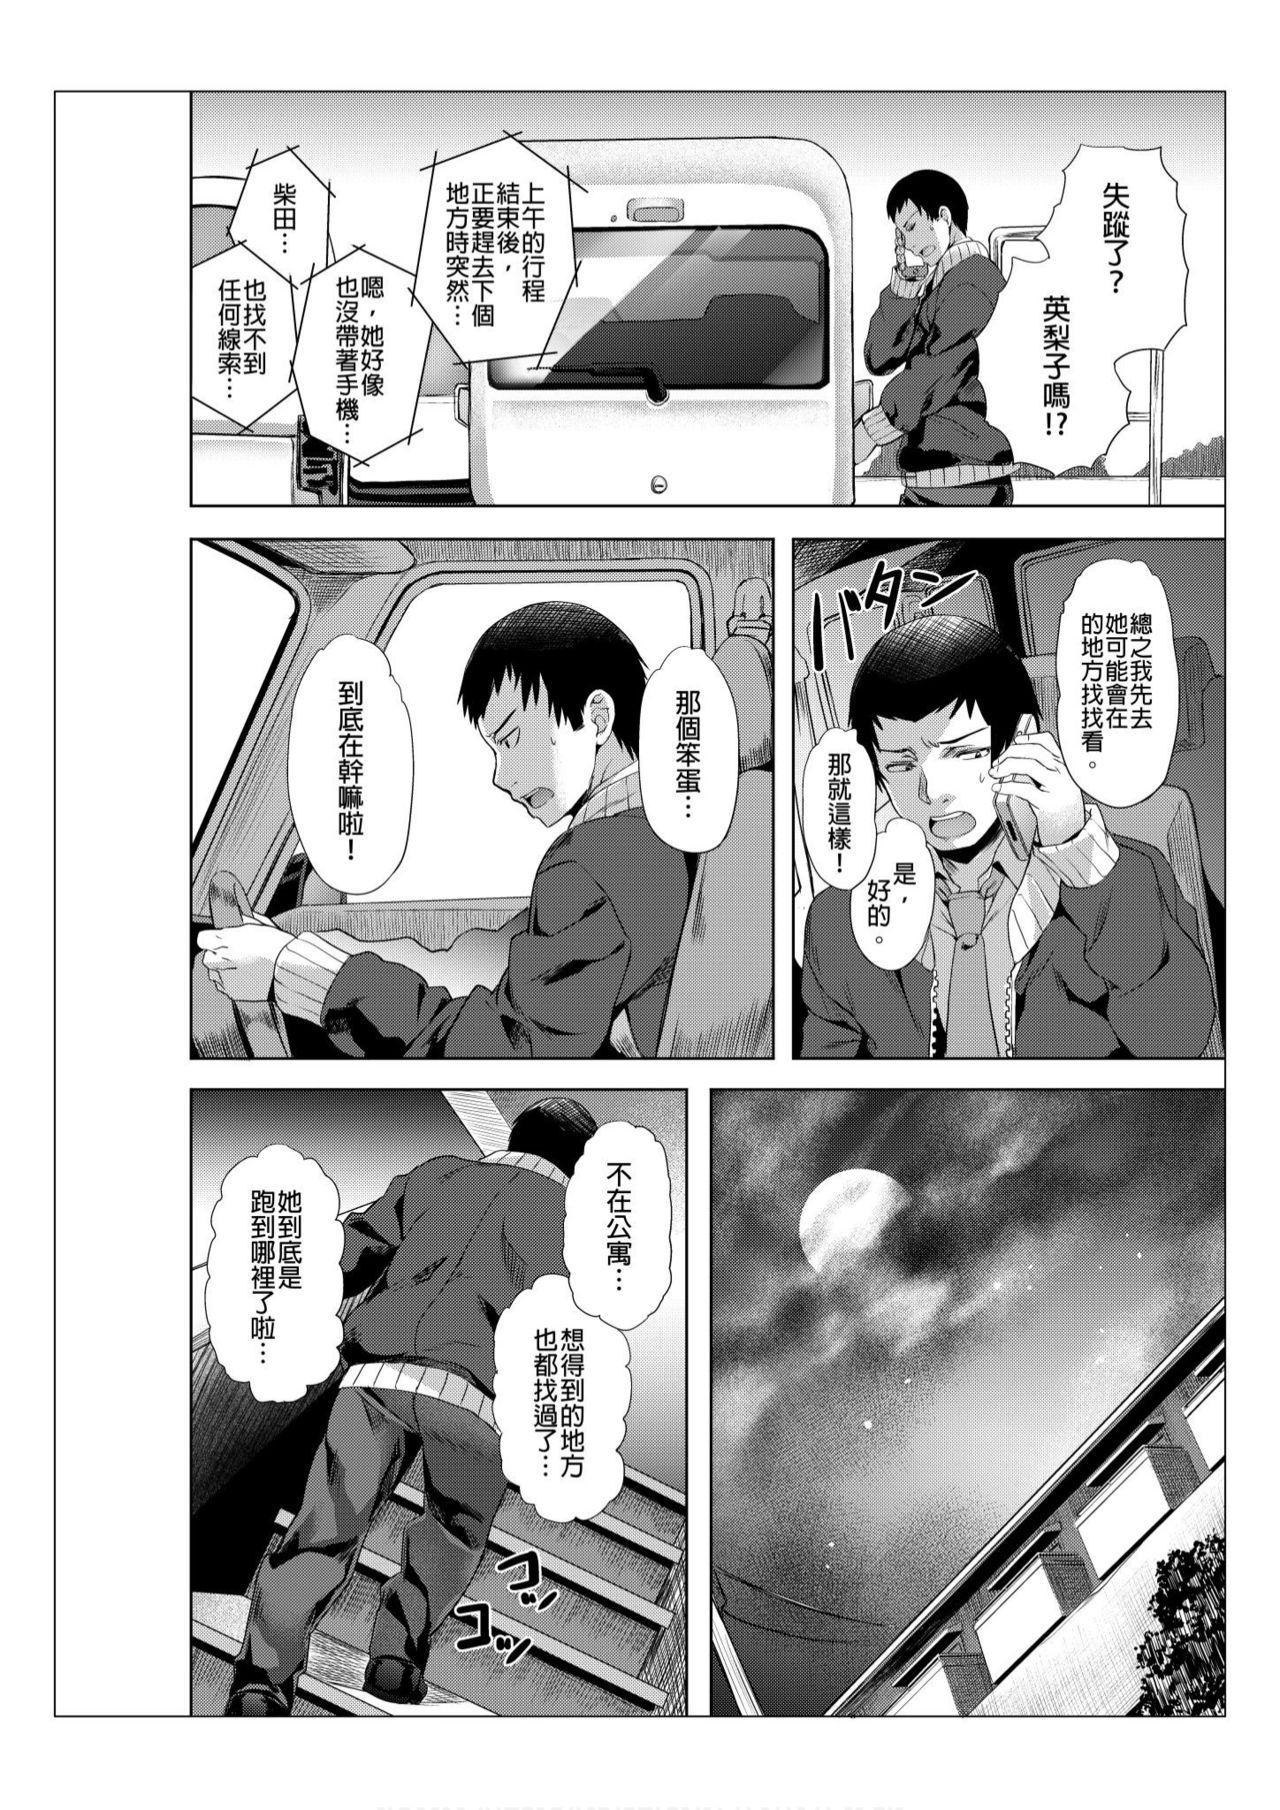 [Nagayori] Towel Ichimai de Otoko Buro.~ Shiranai Ojisan-tachi to Honiki Sex ~ | 只裹了條小毛巾就進男浴池的我。~被完全不認識的大叔們弄到高潮了~ [Chinese] [Decensored] 62